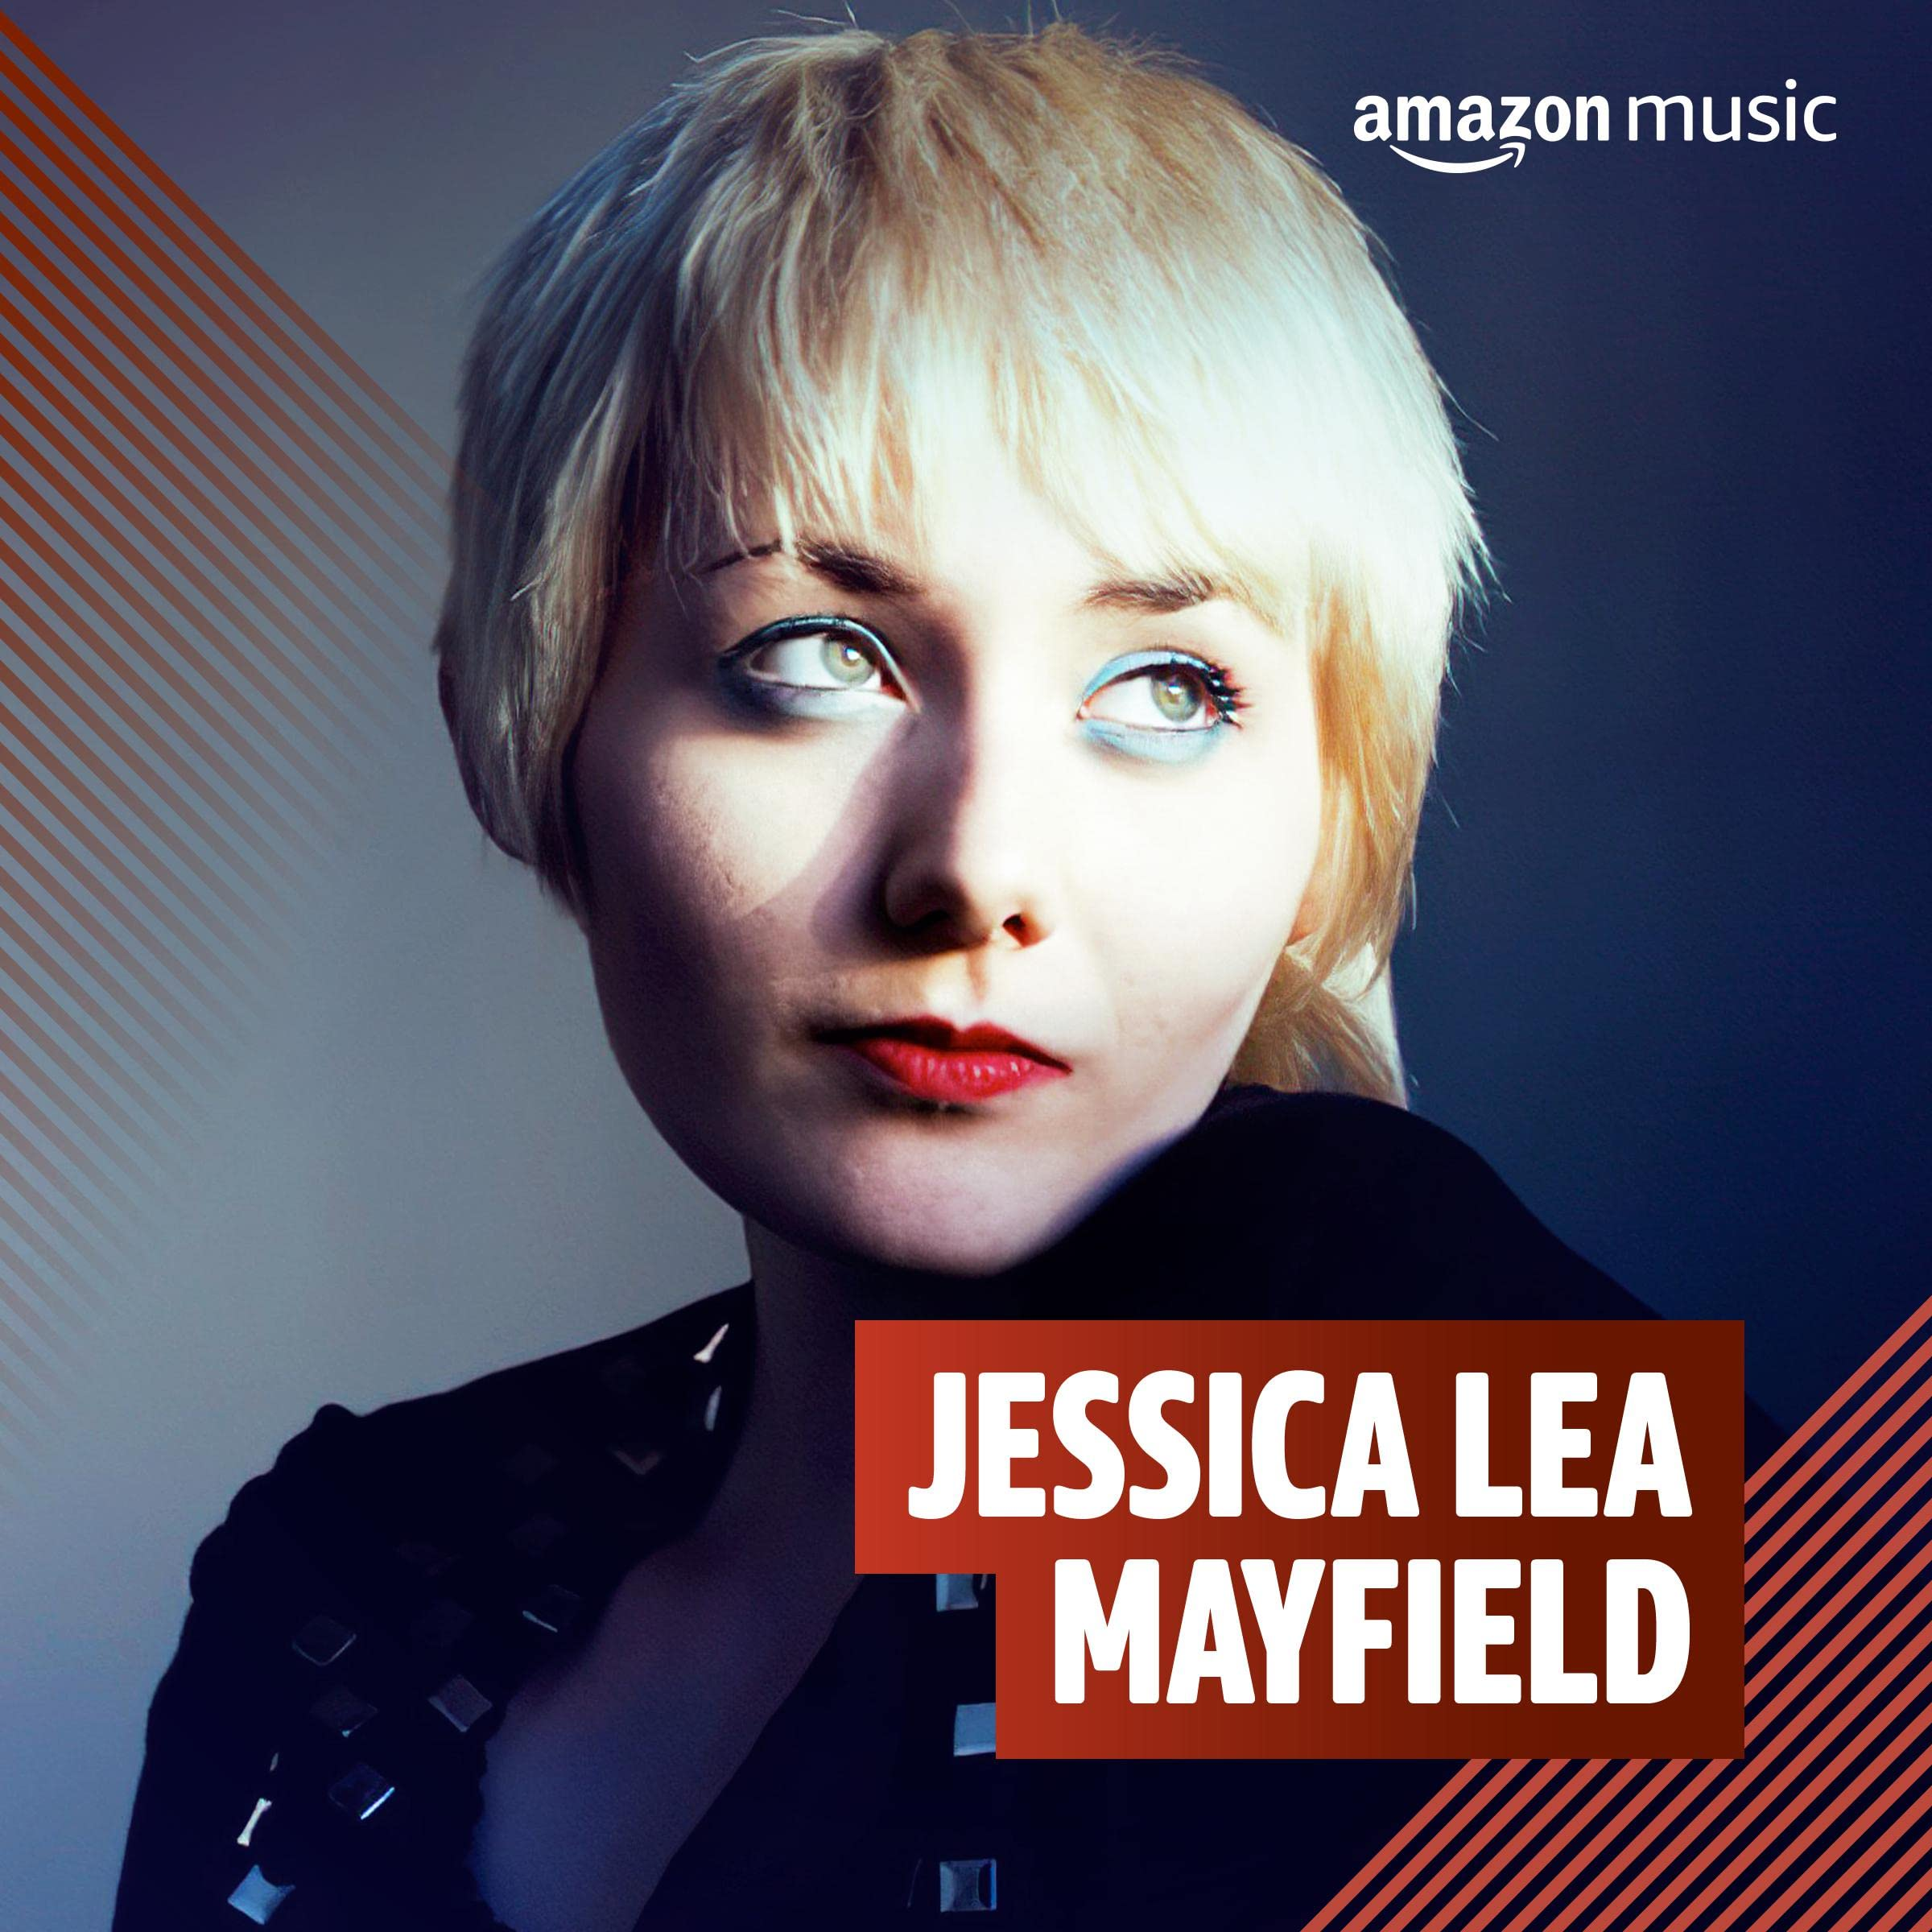 Jessica Lea Mayfield